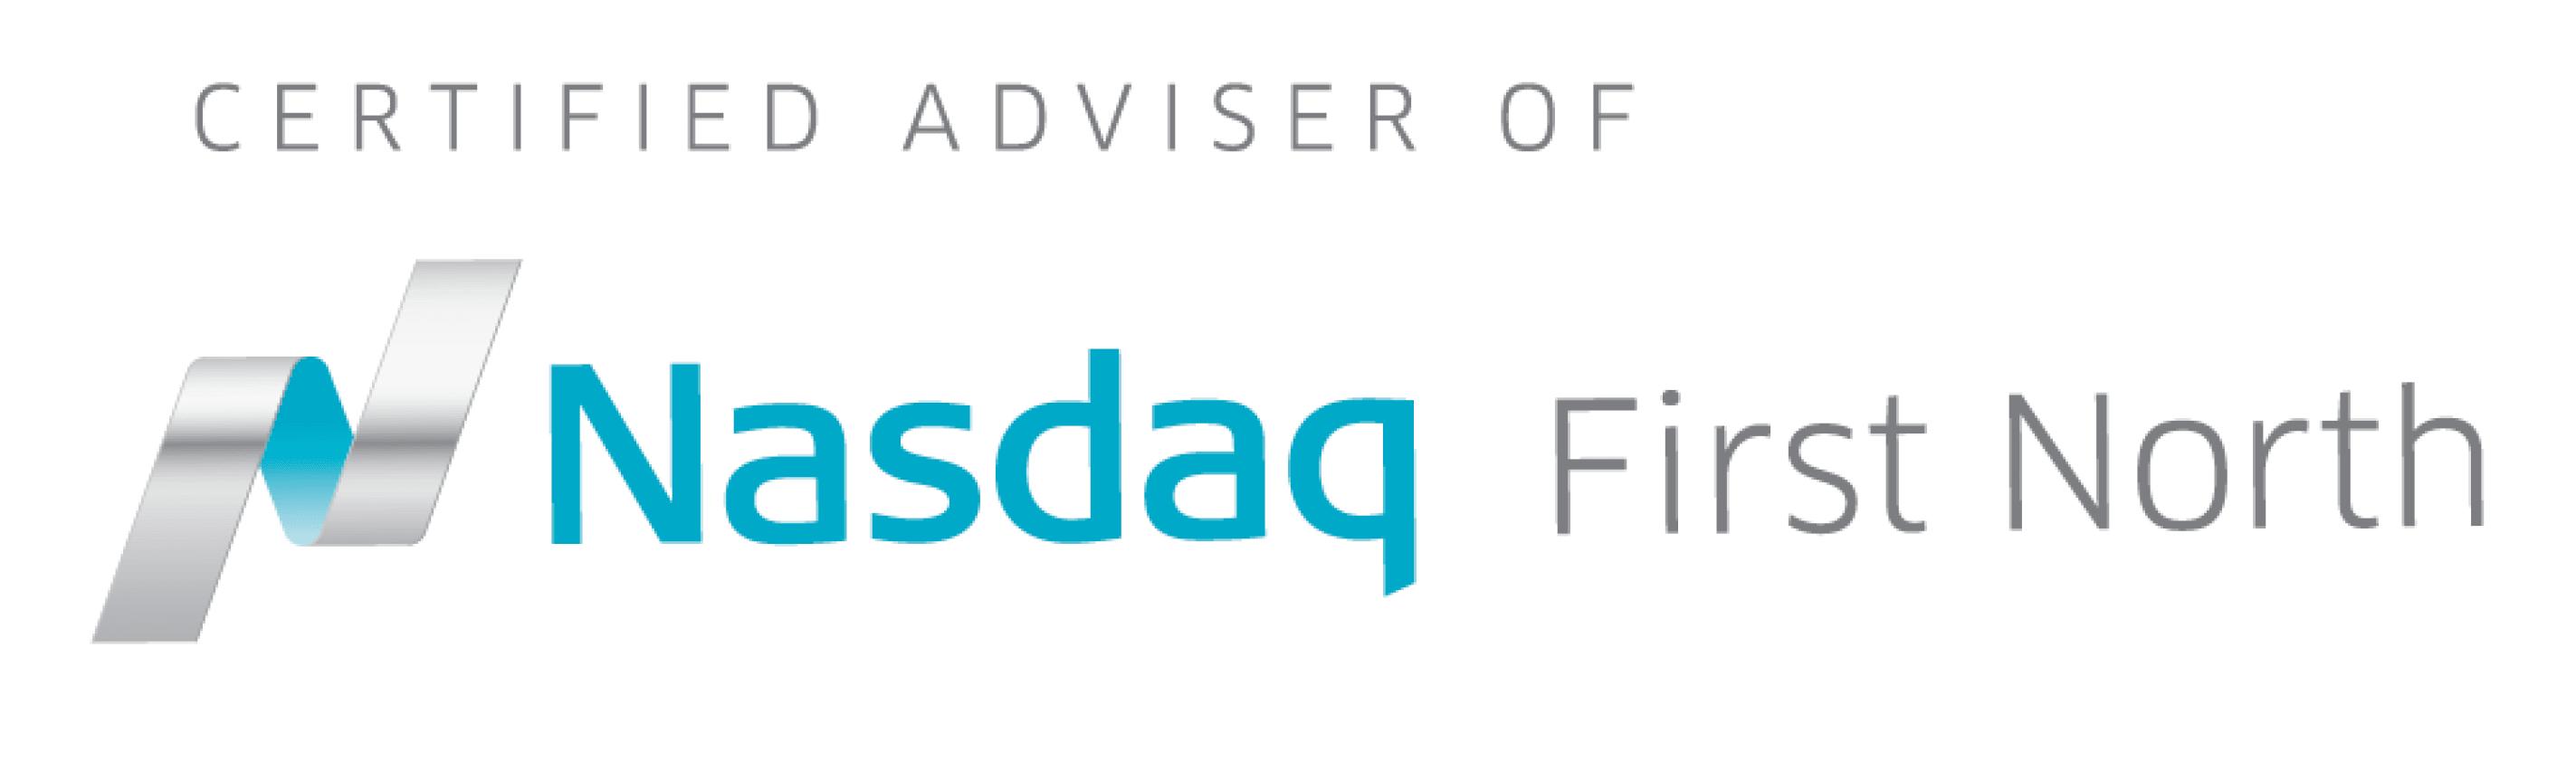 public://media/news/certified_adviser_of_nasdaq_first_north.png